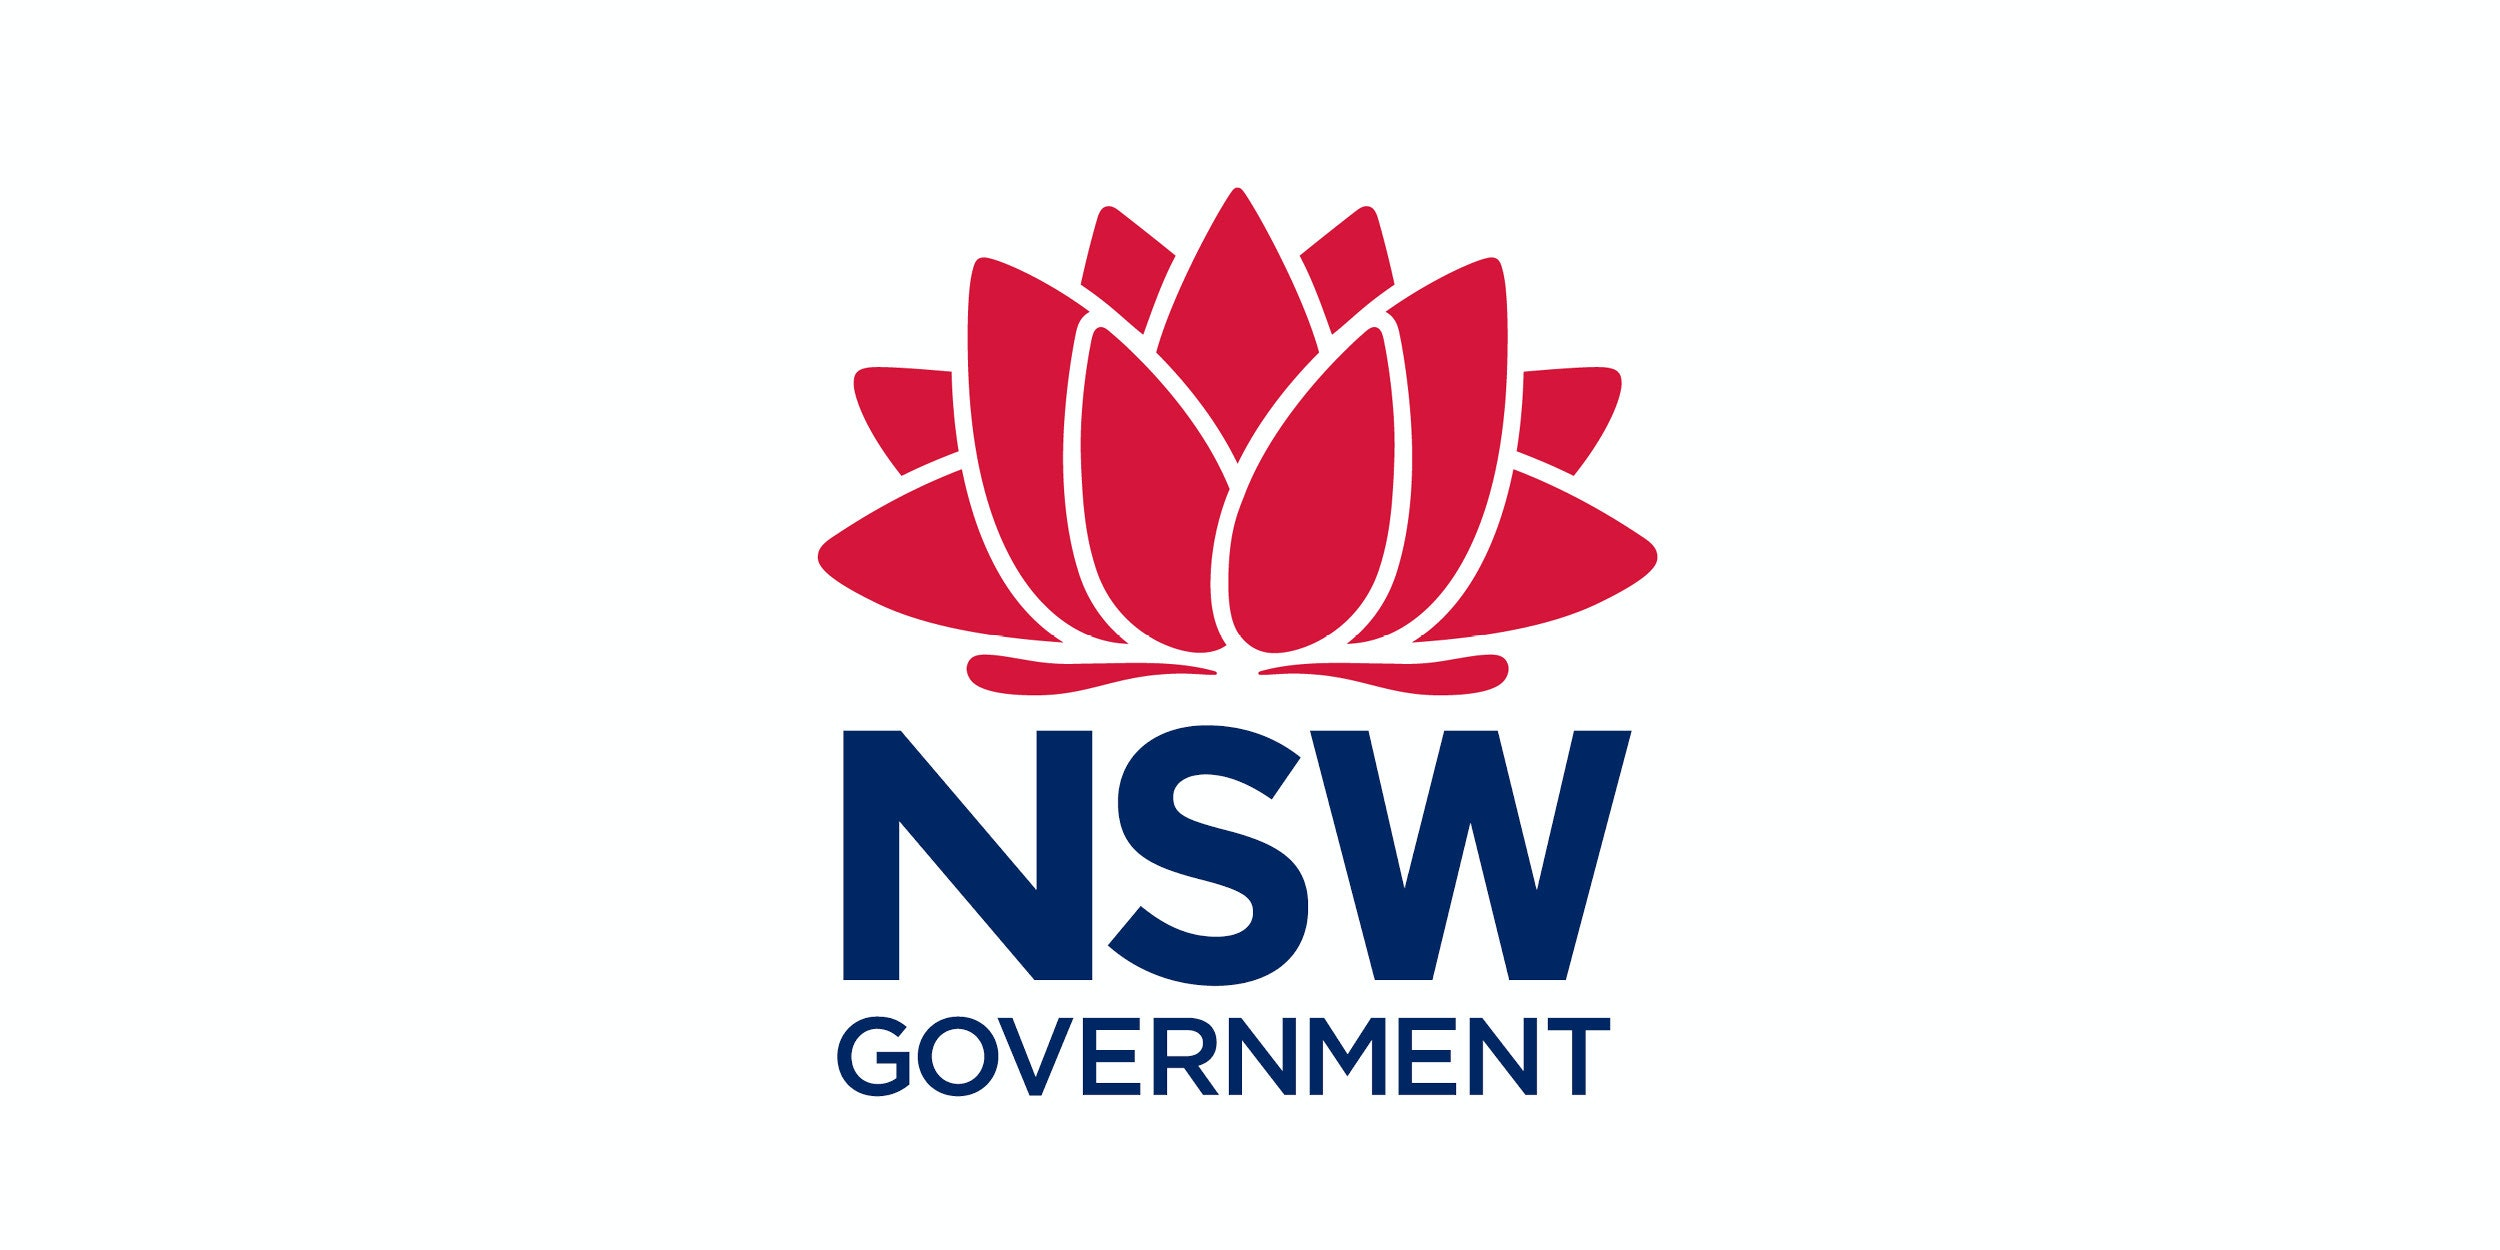 Nsw Gov Logo Small